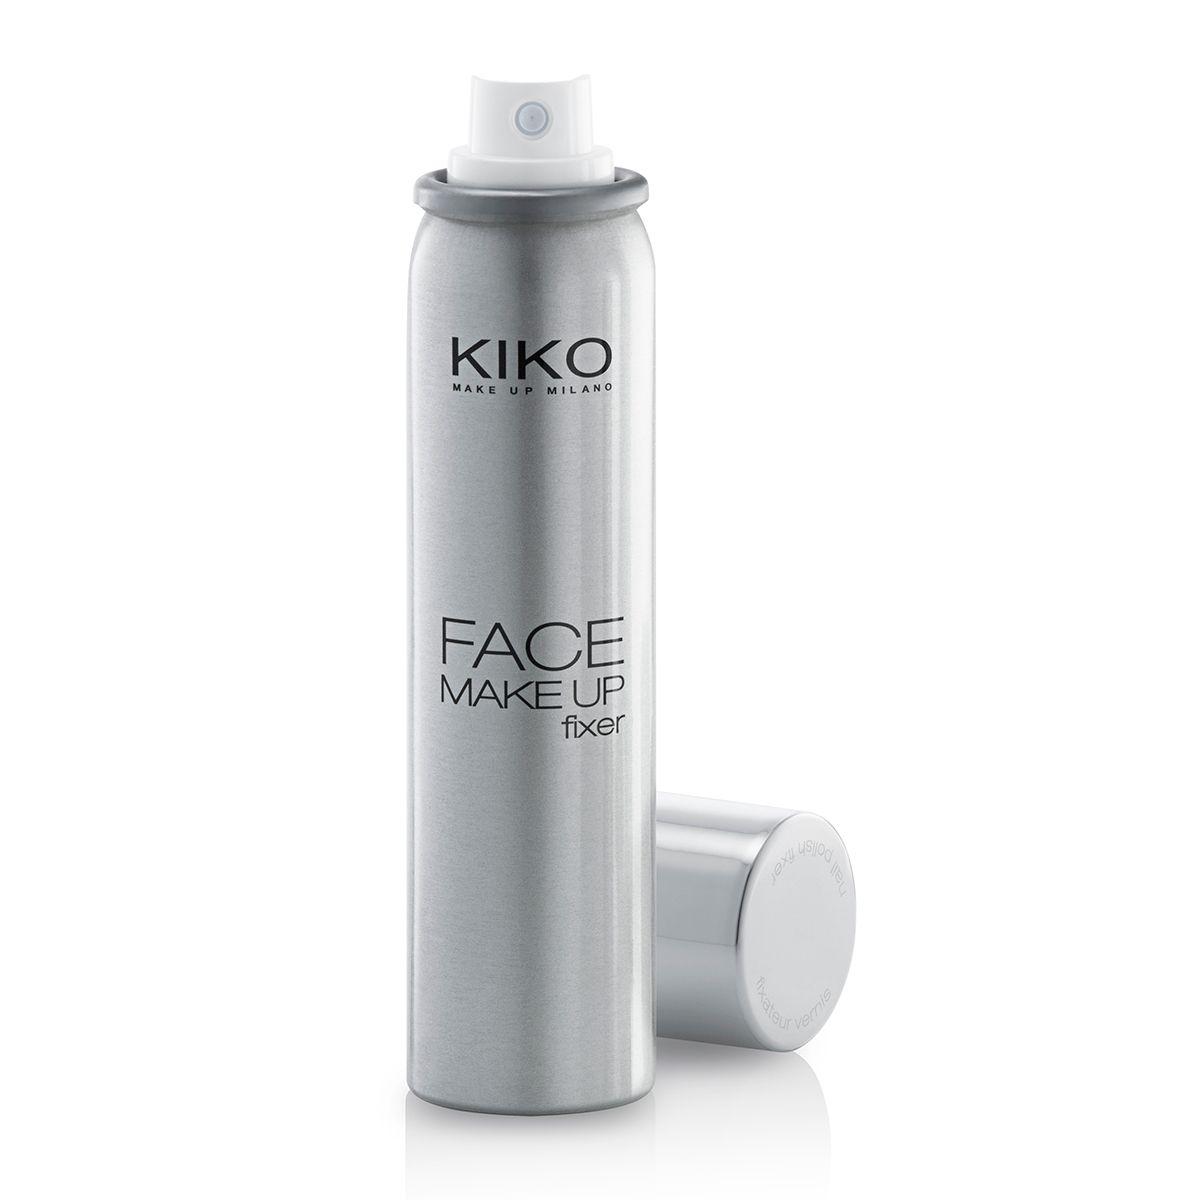 4241a3da3c9 Kiko Face Makeup Fixer Kullanıcı Yorumları | Newmakeupjdi.co